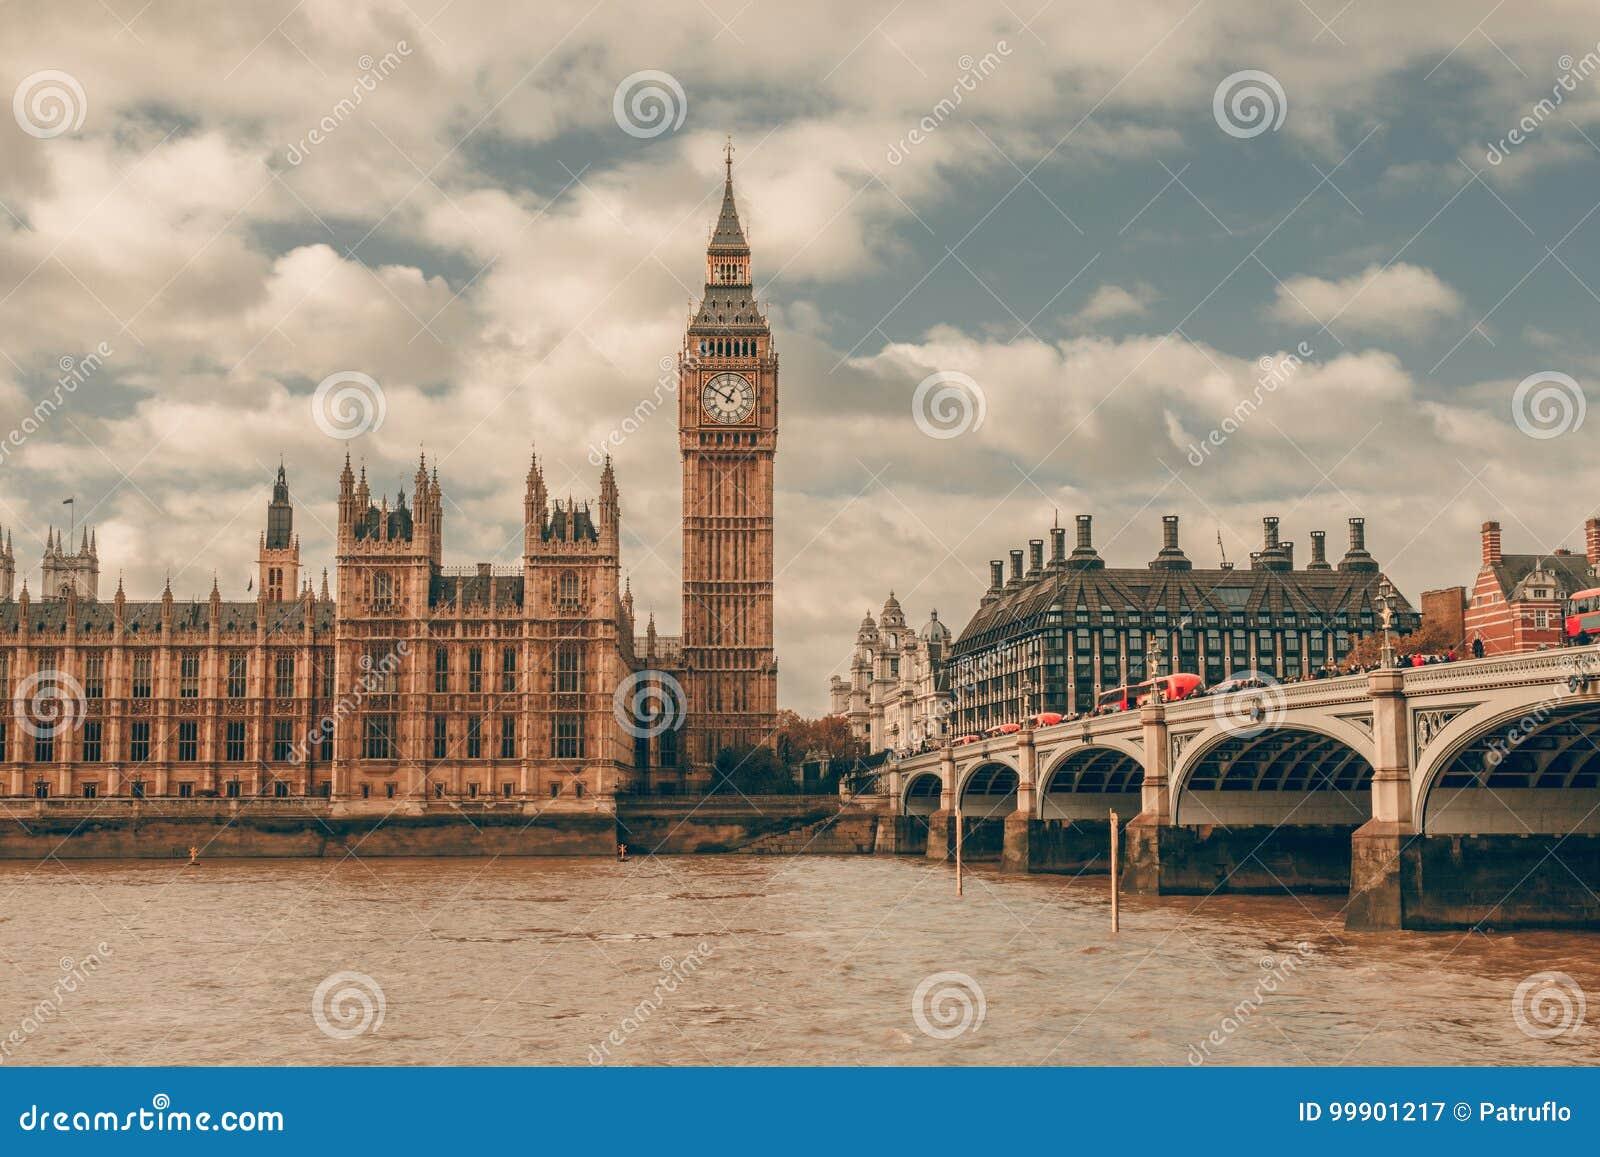 London, UK. Big Ben in Westminster Palace on River Thames